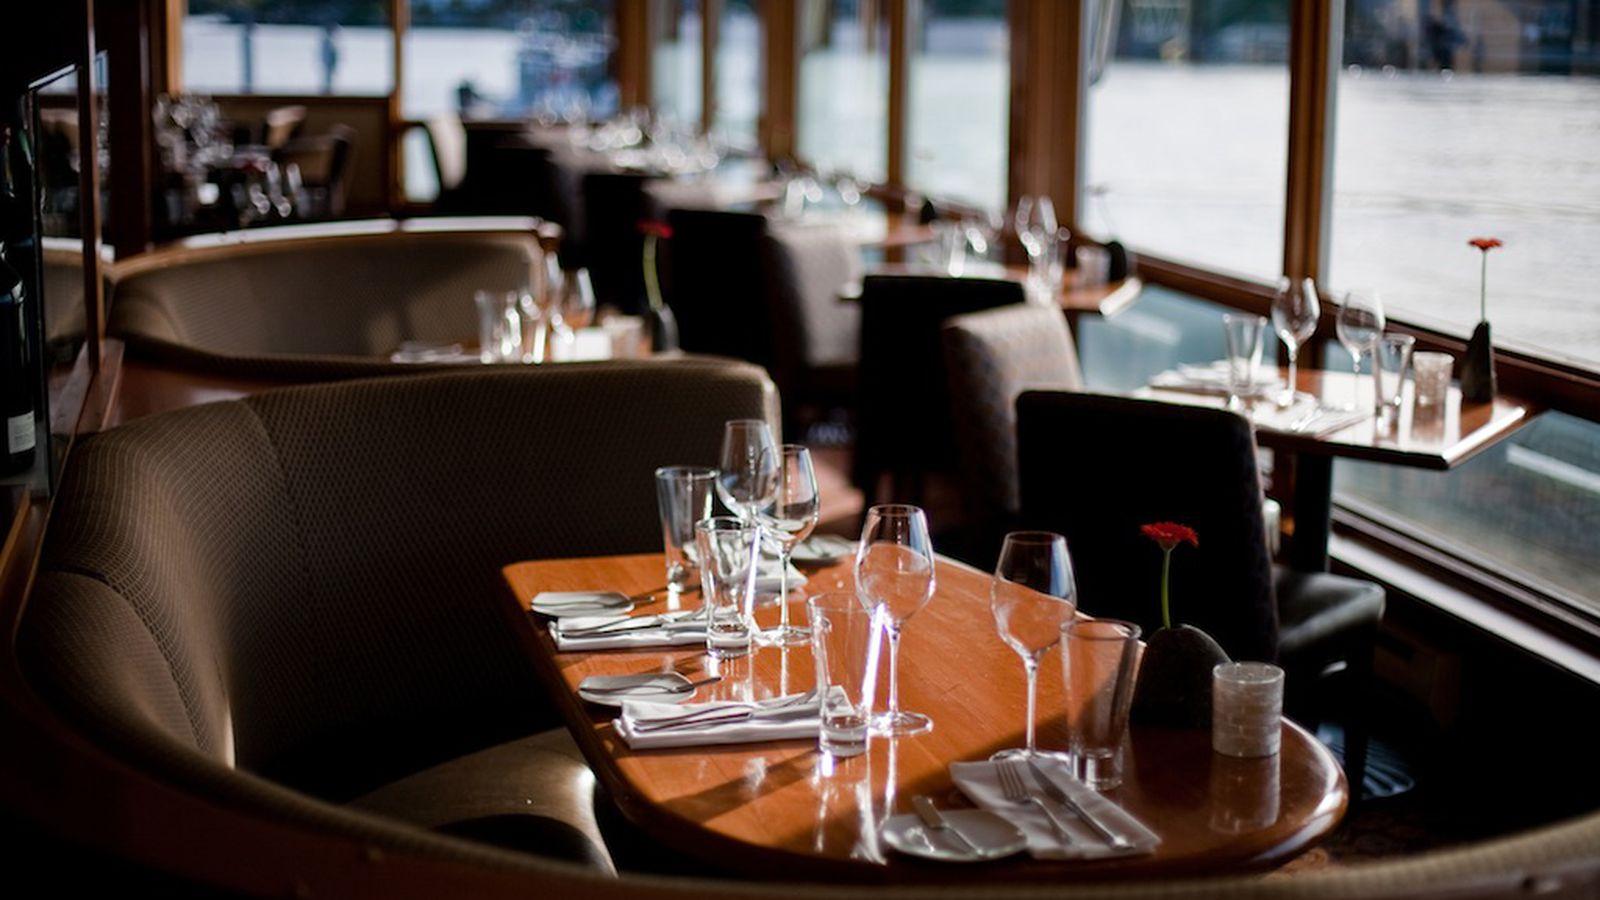 Ray S Boathouse Cafe Menu